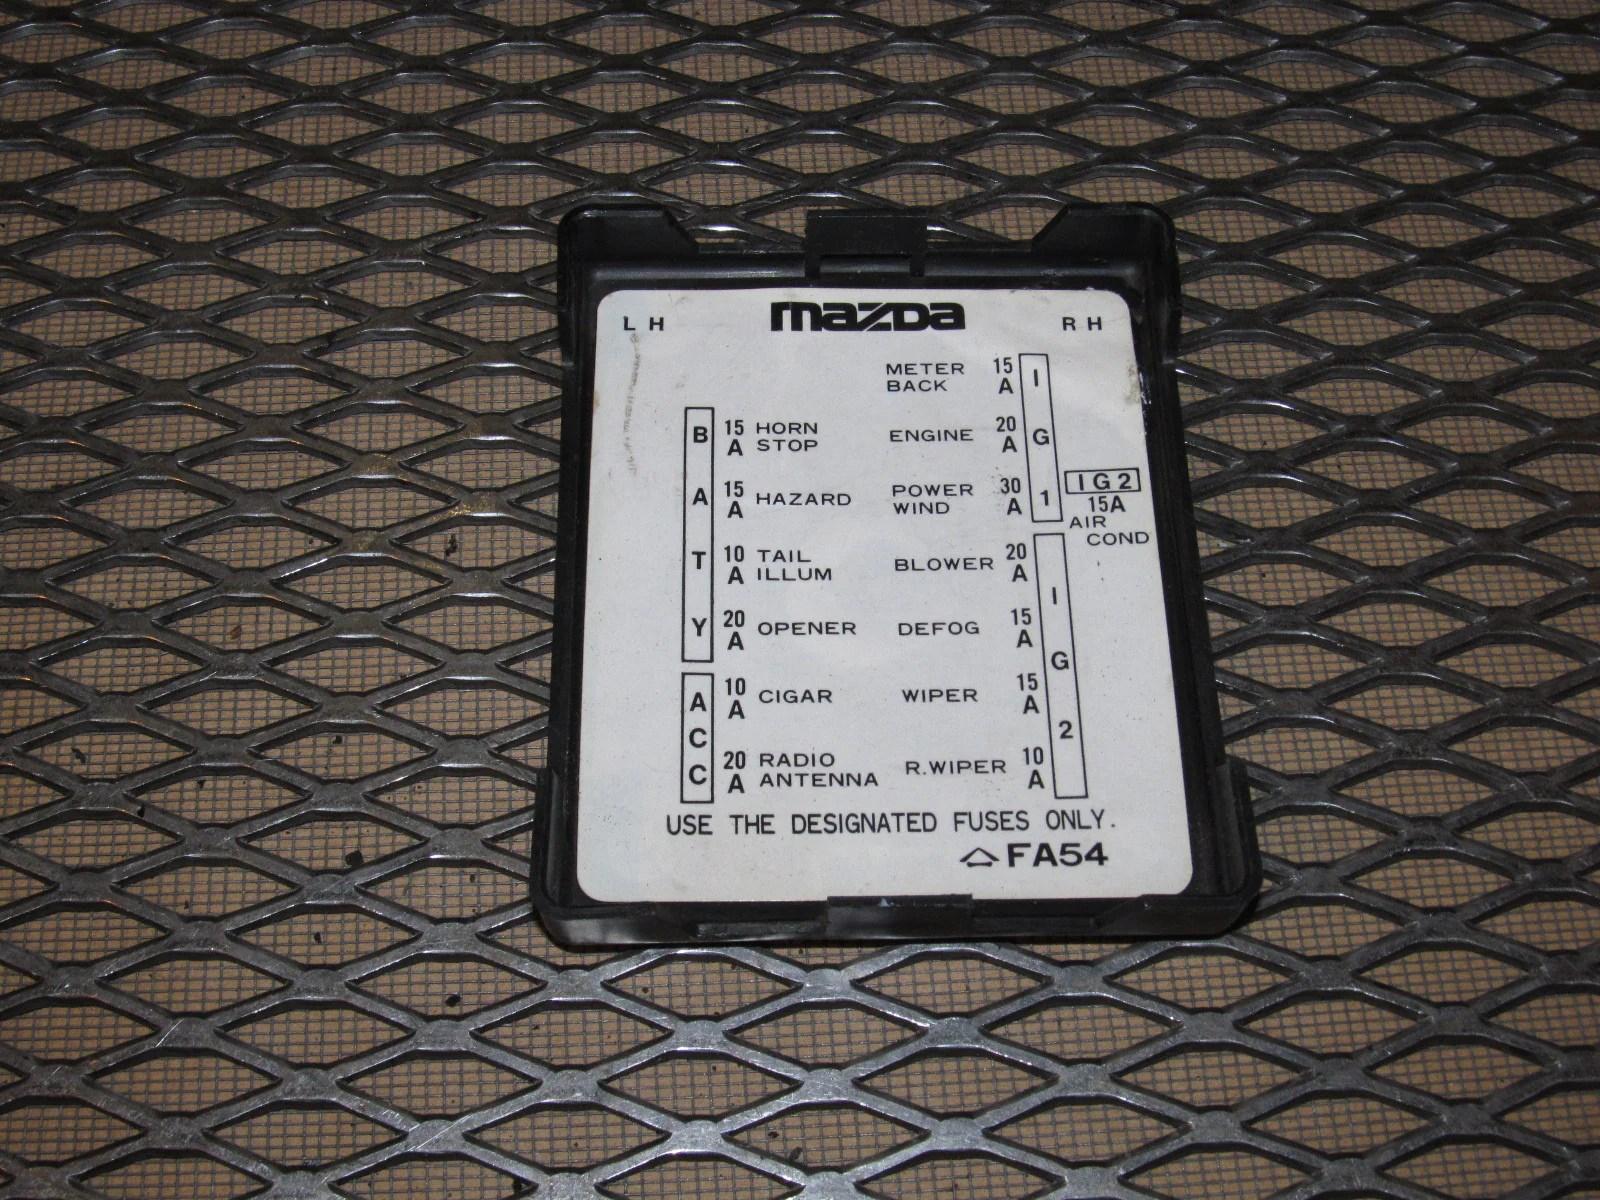 medium resolution of rx7 fuse box diagram wiring diagram 1986 mazda rx7 fuse box diagram